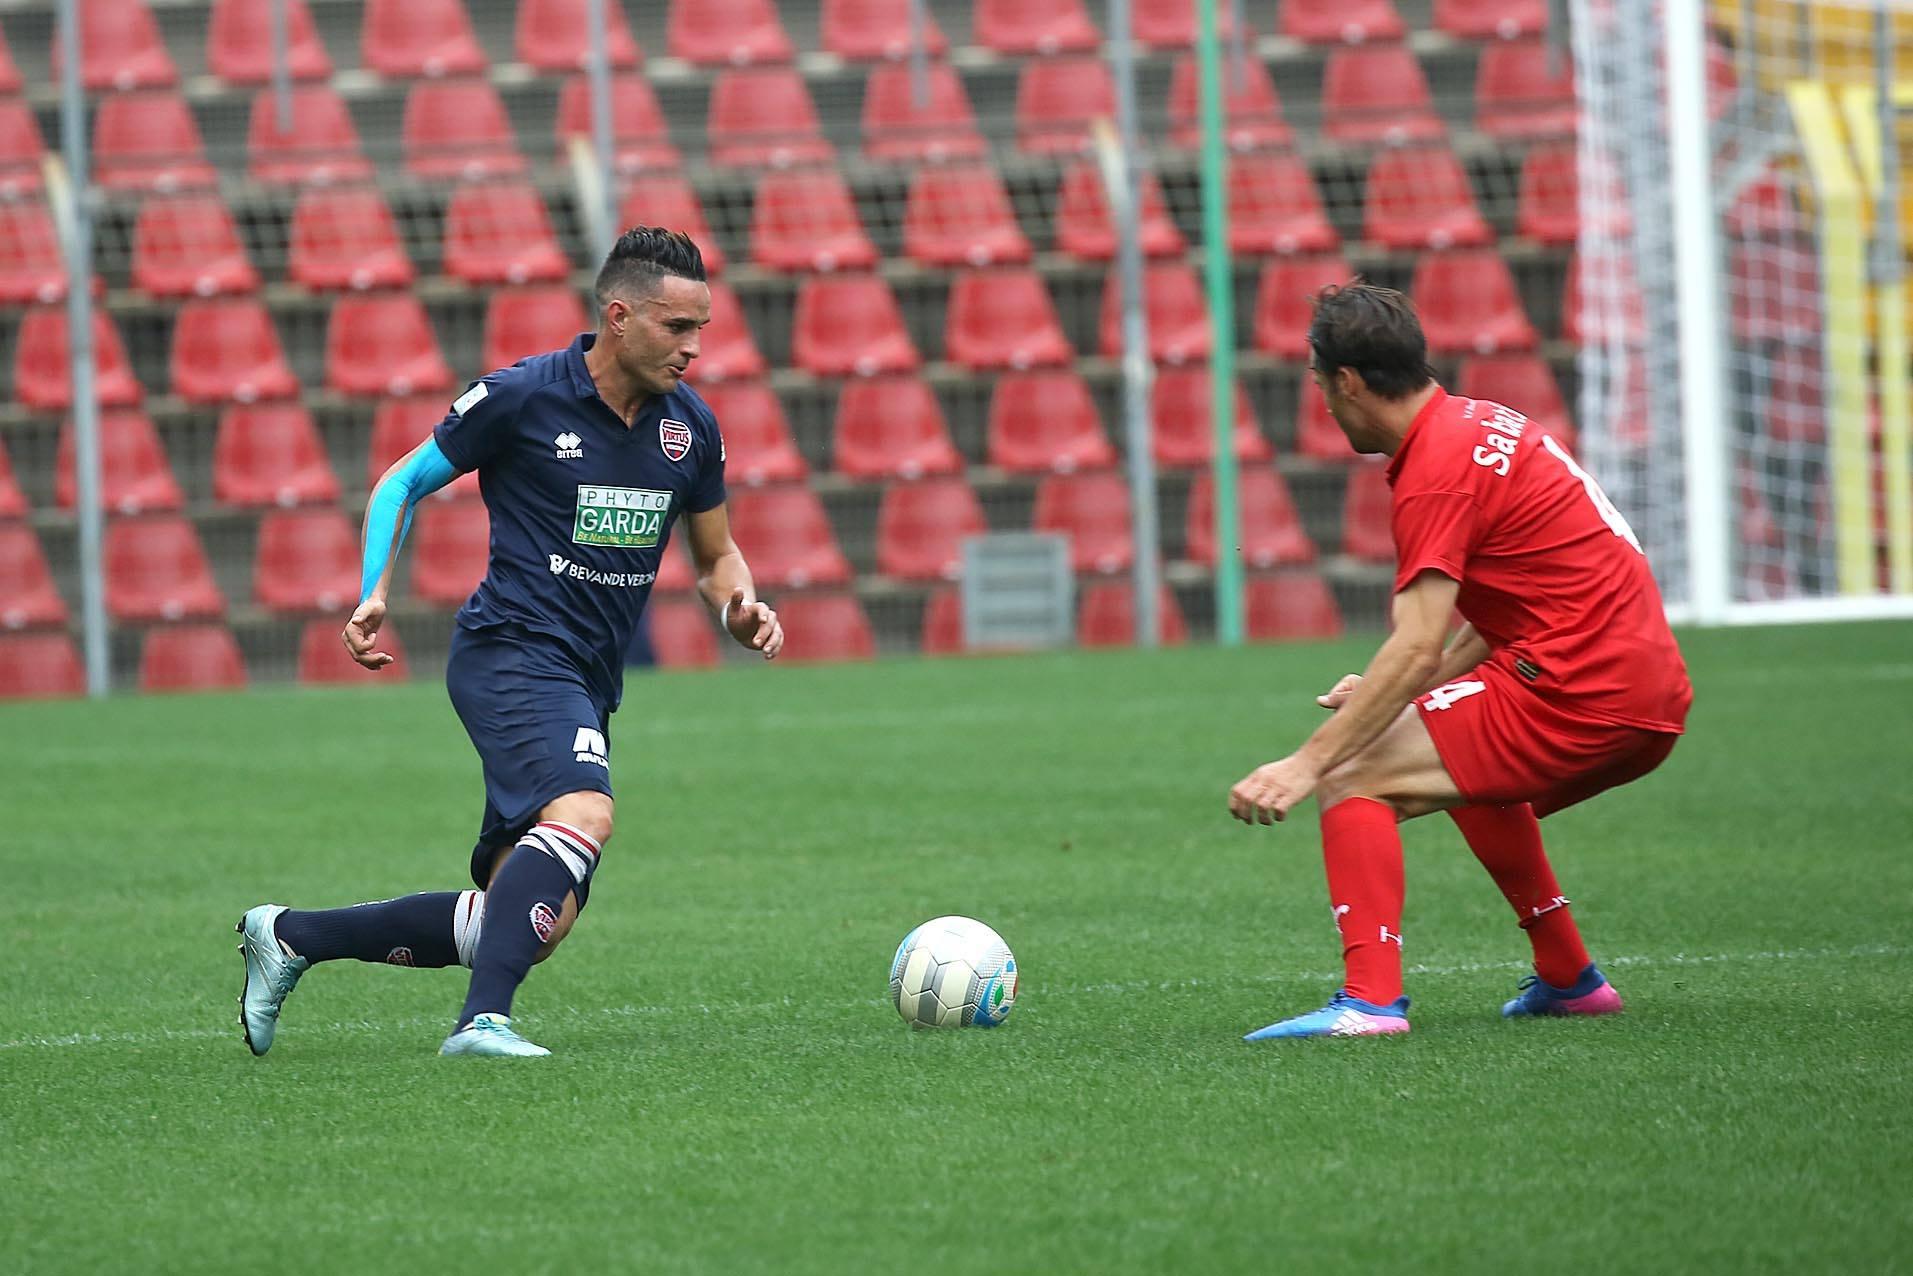 Lega Pro Girone B Virtus Verona-Ternana, volto noto fra i virtussini